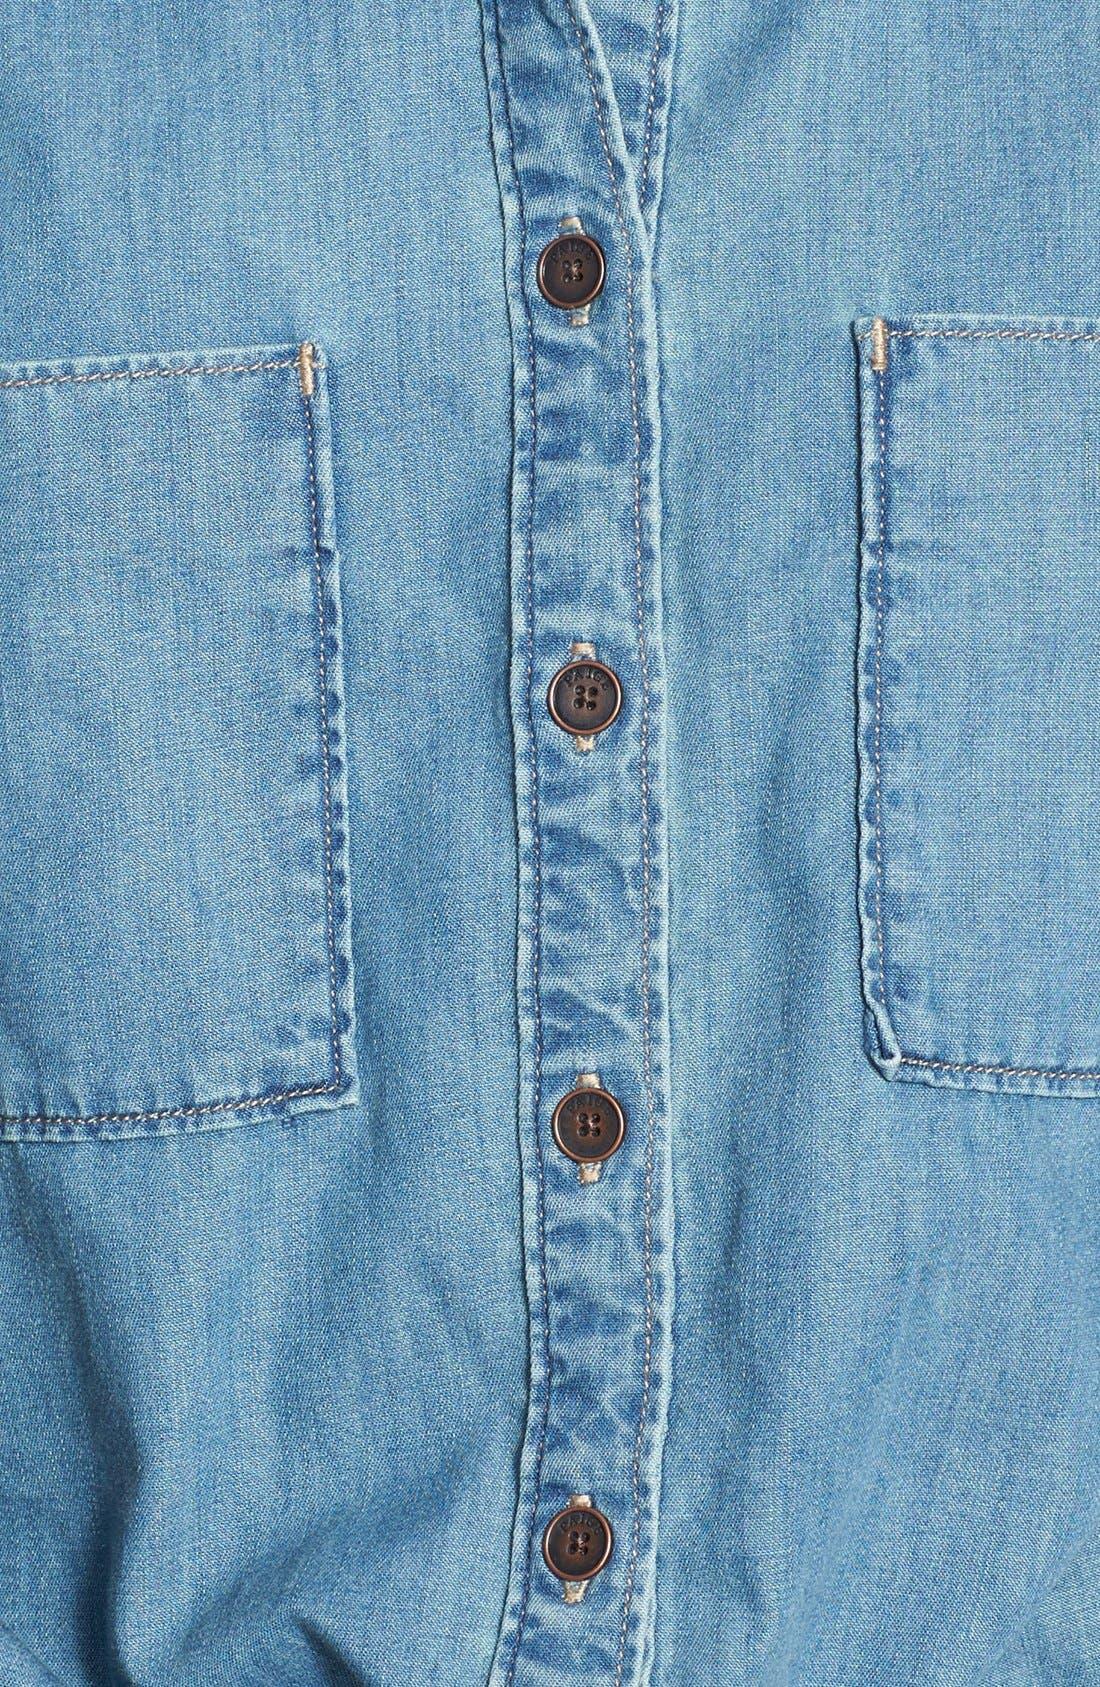 PAIGE, Denim 'Mila' Denim Shirtdress, Alternate thumbnail 3, color, 400